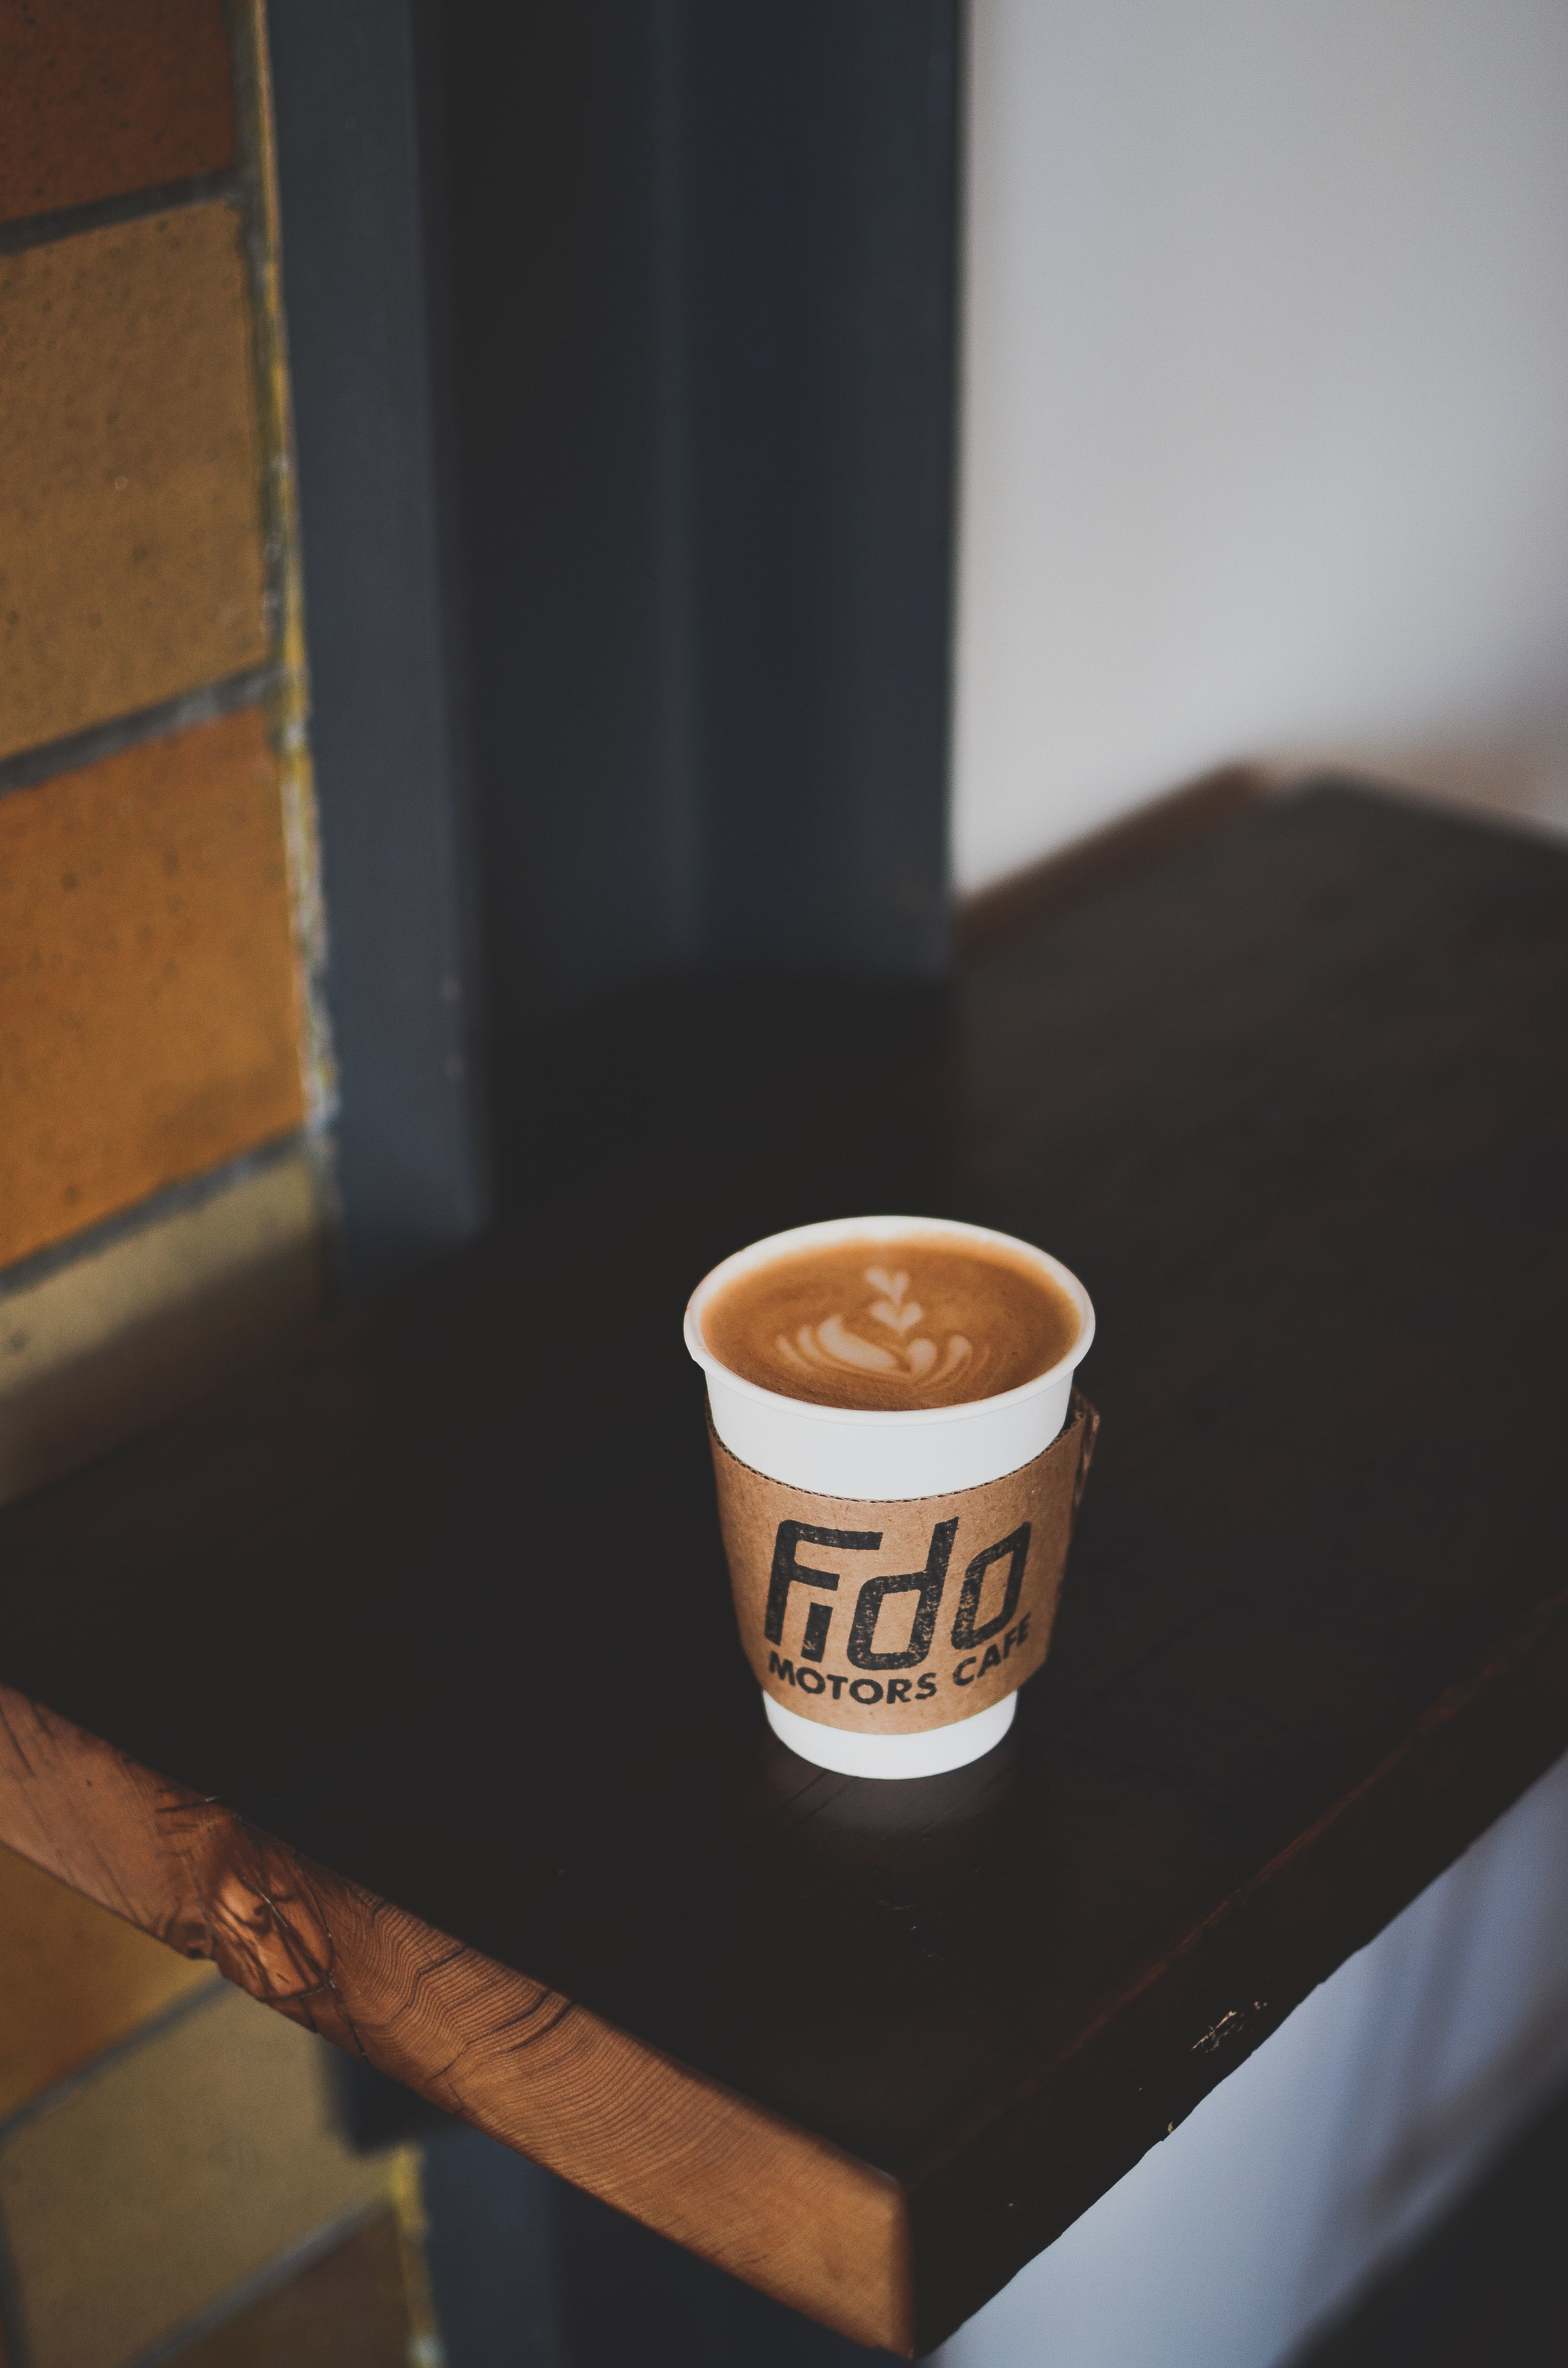 Wendling_Boyd_Fido_Motors_Coffee-10.jpg